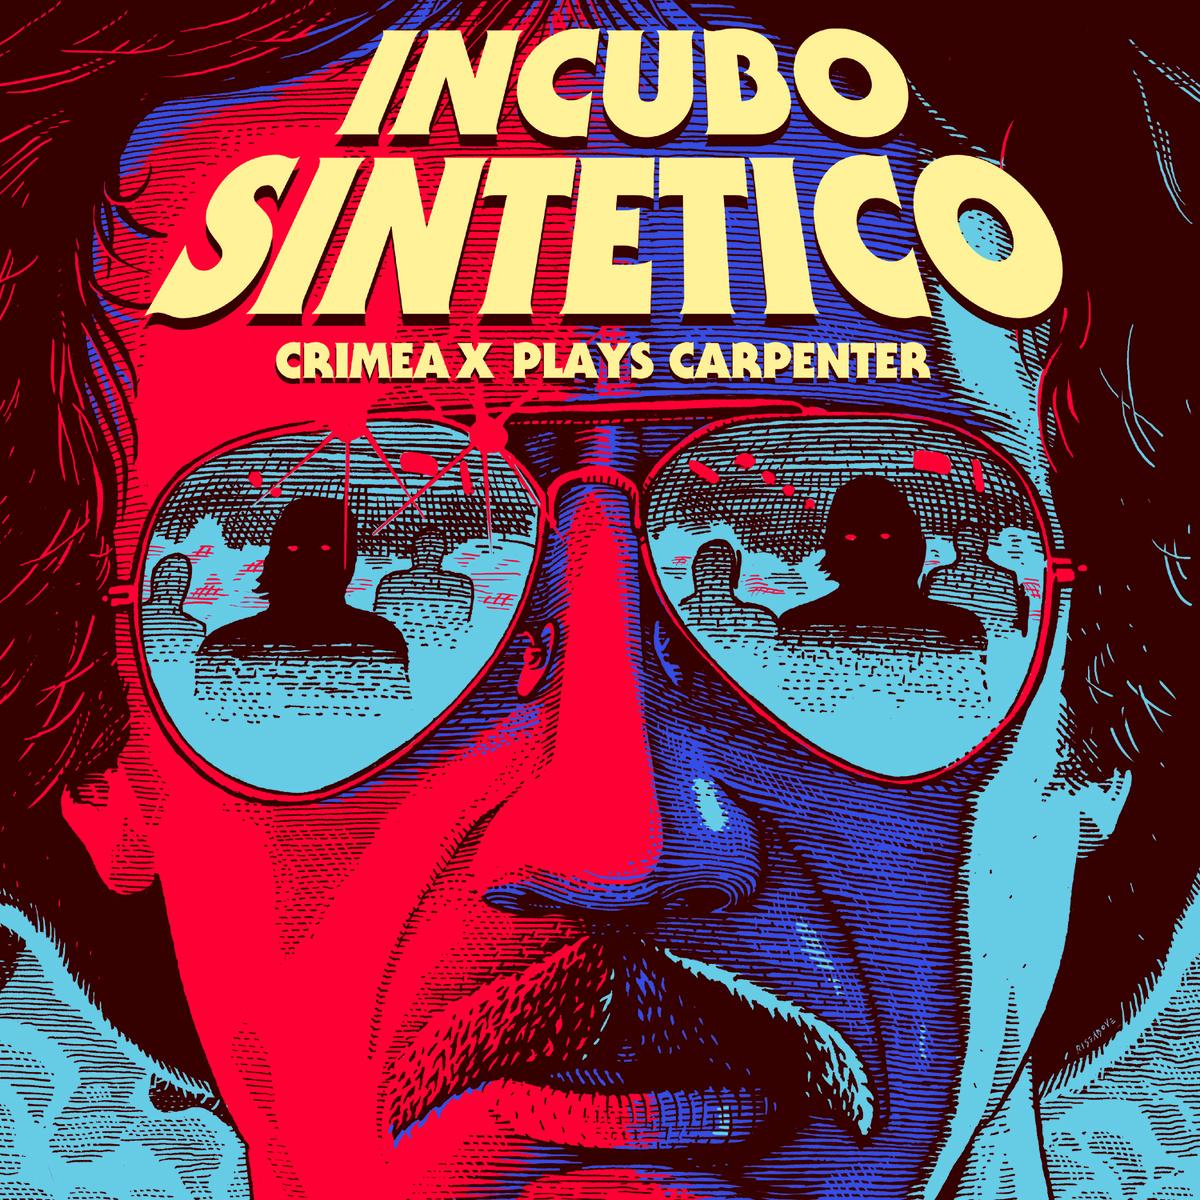 Crimea X - Incubo Sintetico (Crimea X plays Carpenter) [To Lose La Track  Hell Yeah Recordings]